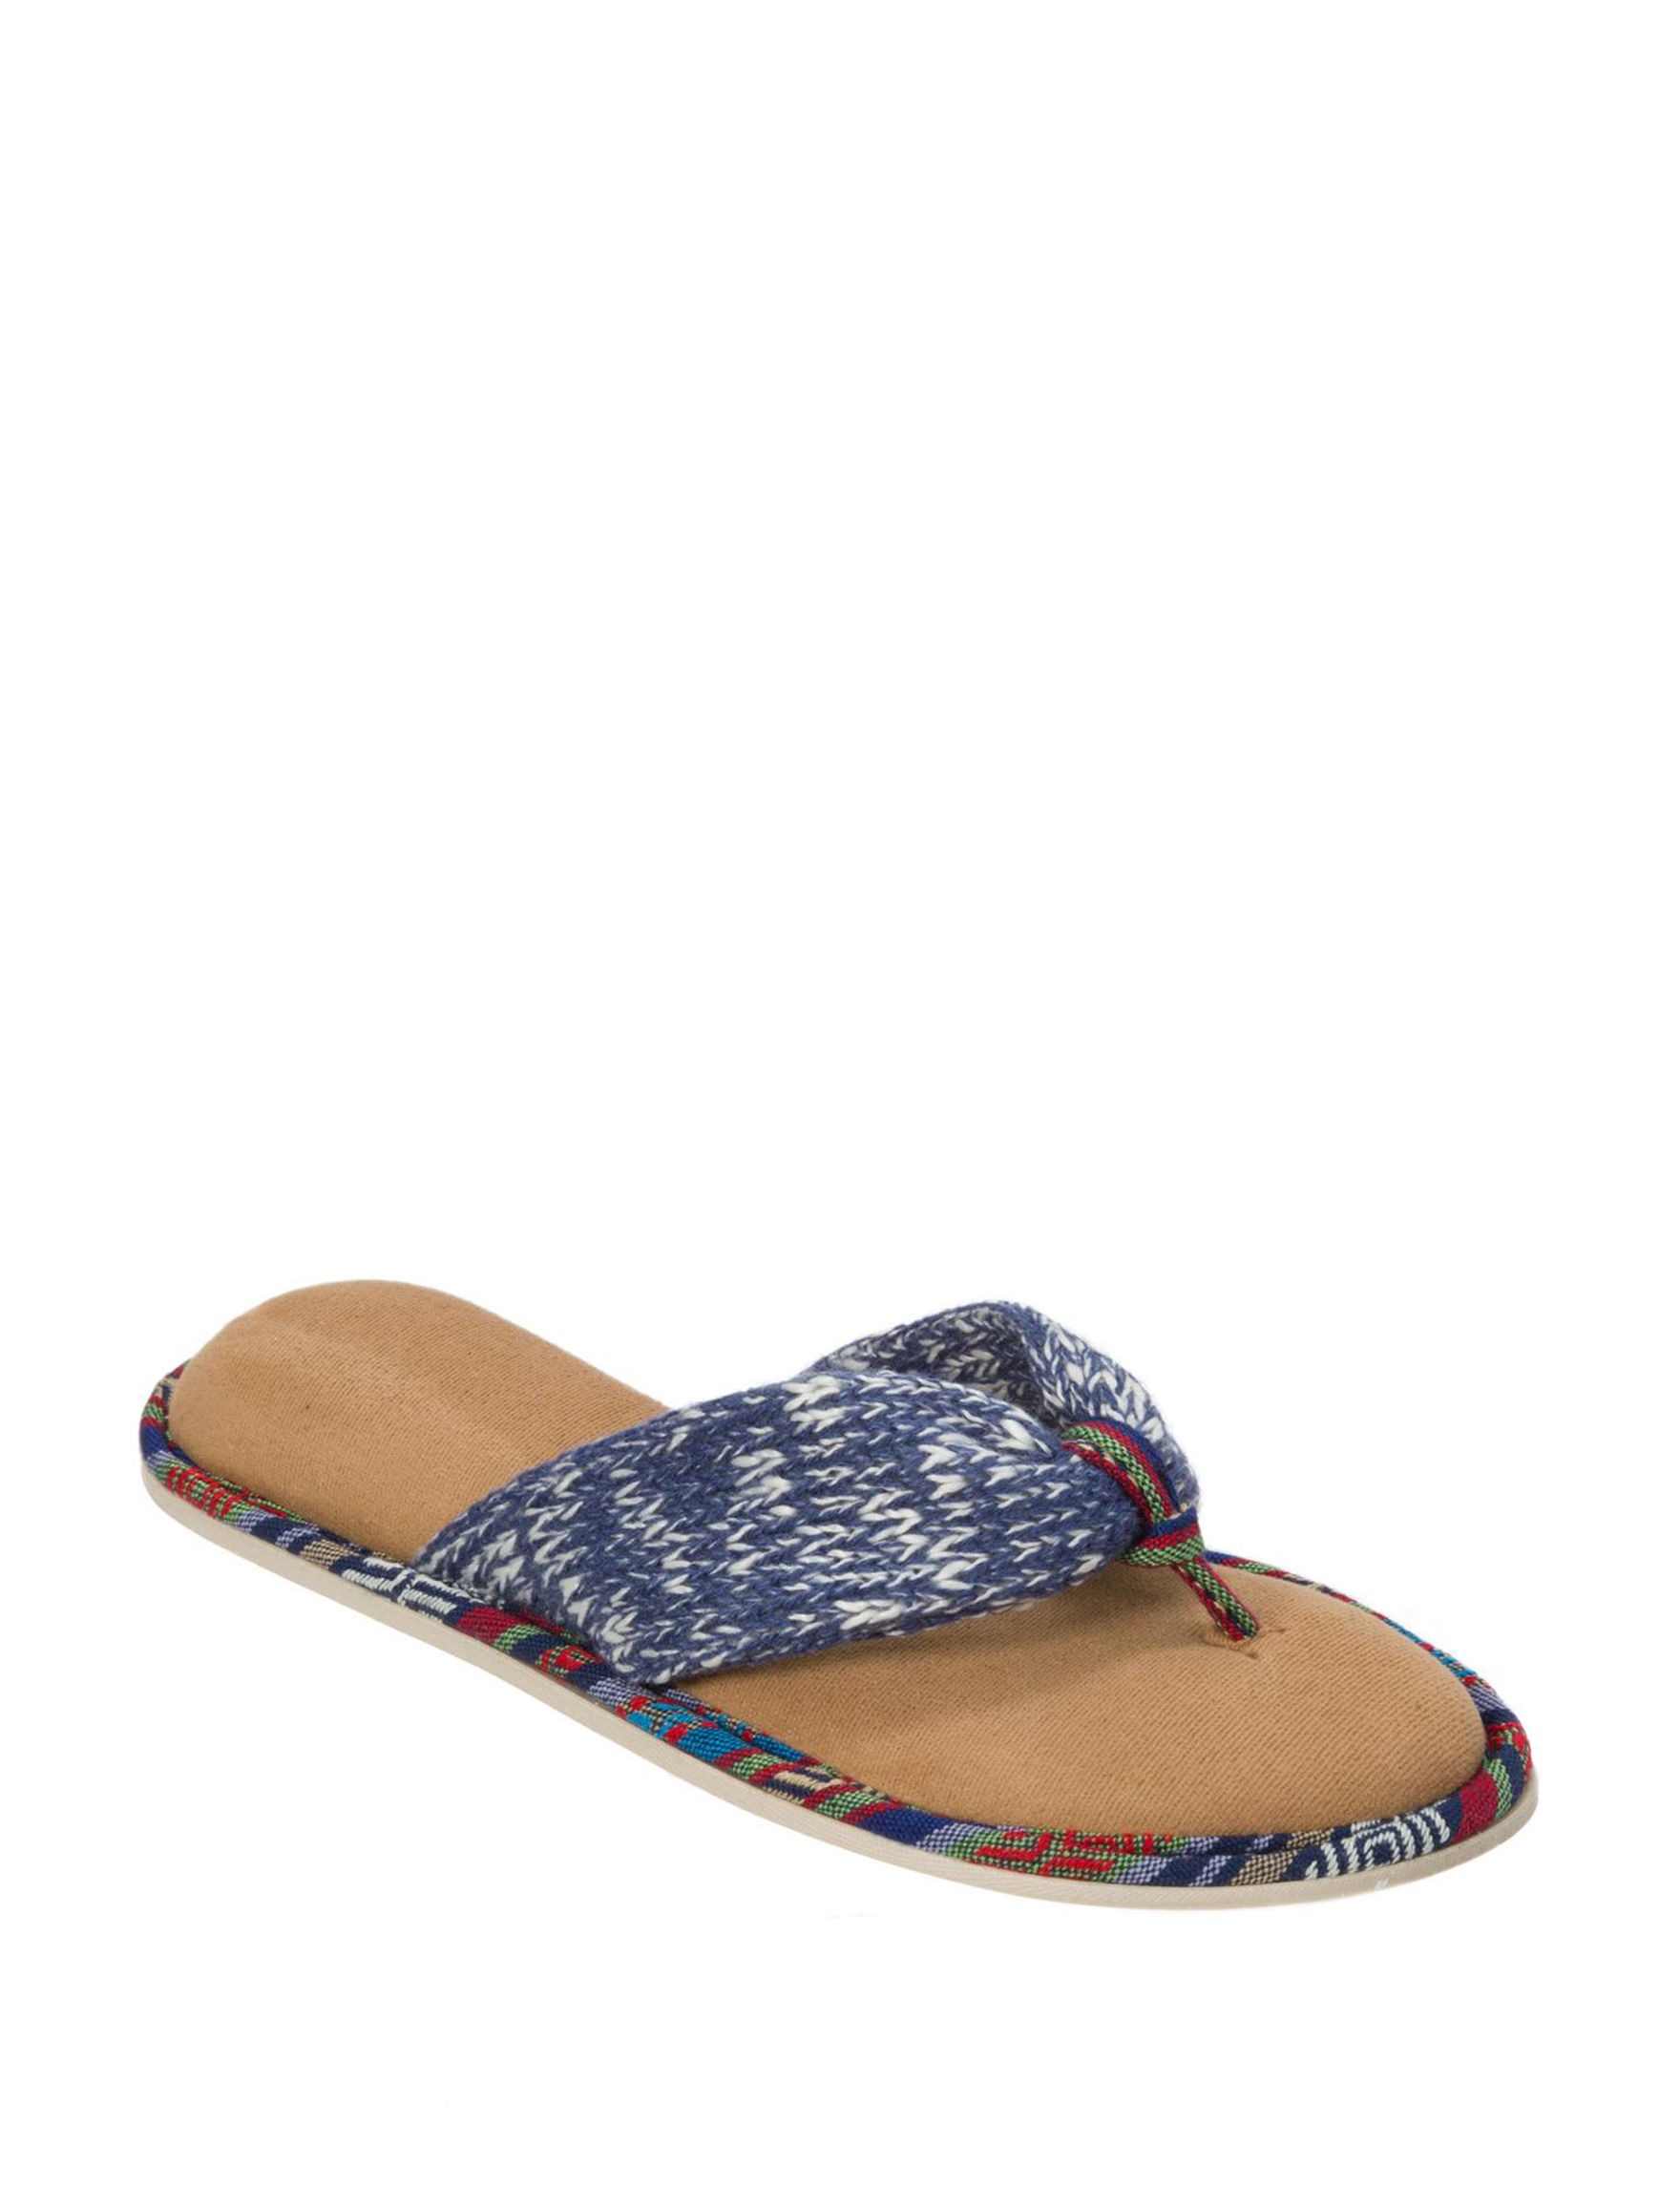 Dearfoam Indigo Slipper Sandals